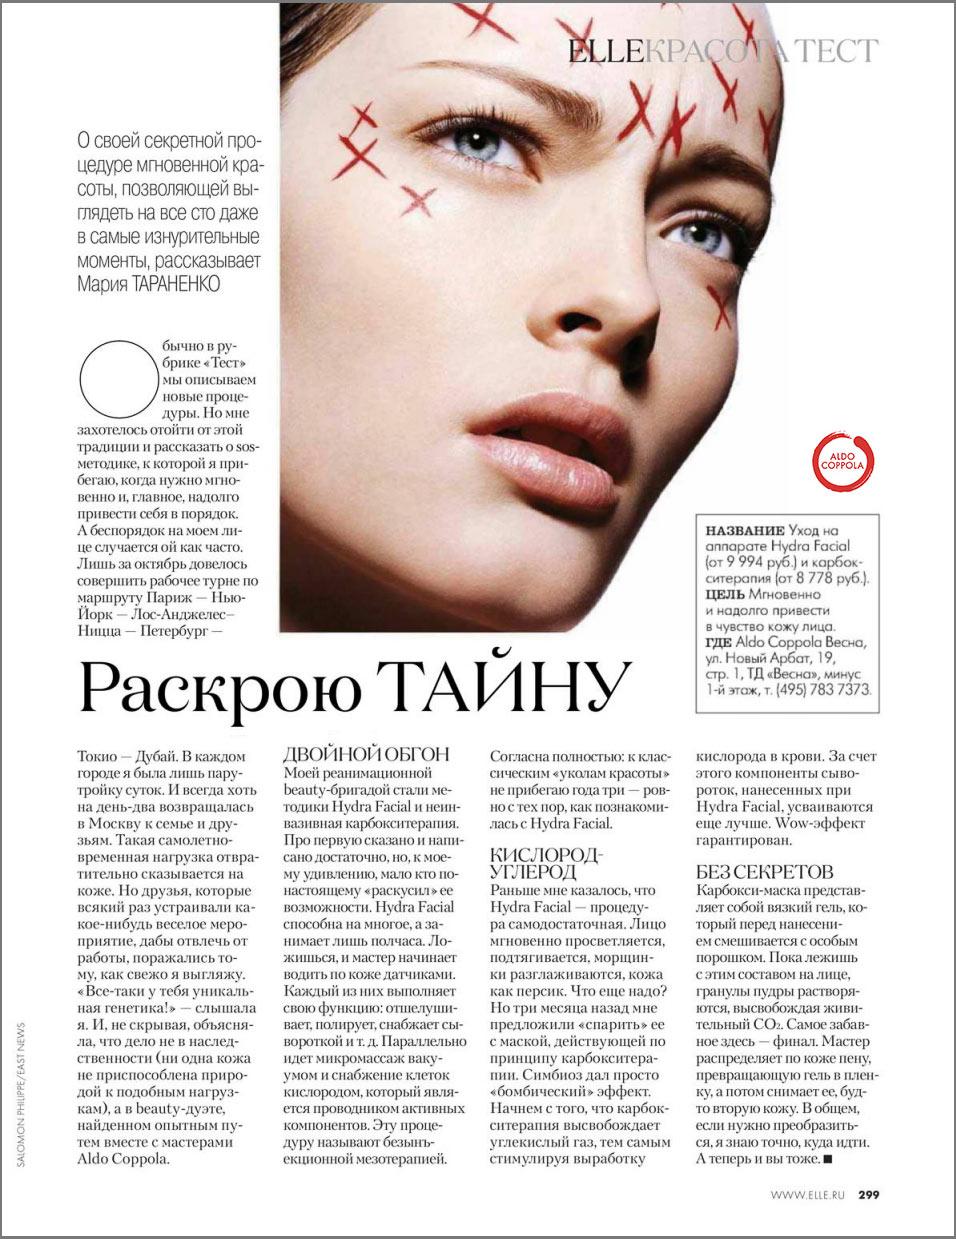 HF AldoCoppola Elle Russia 12 2015 - Elle